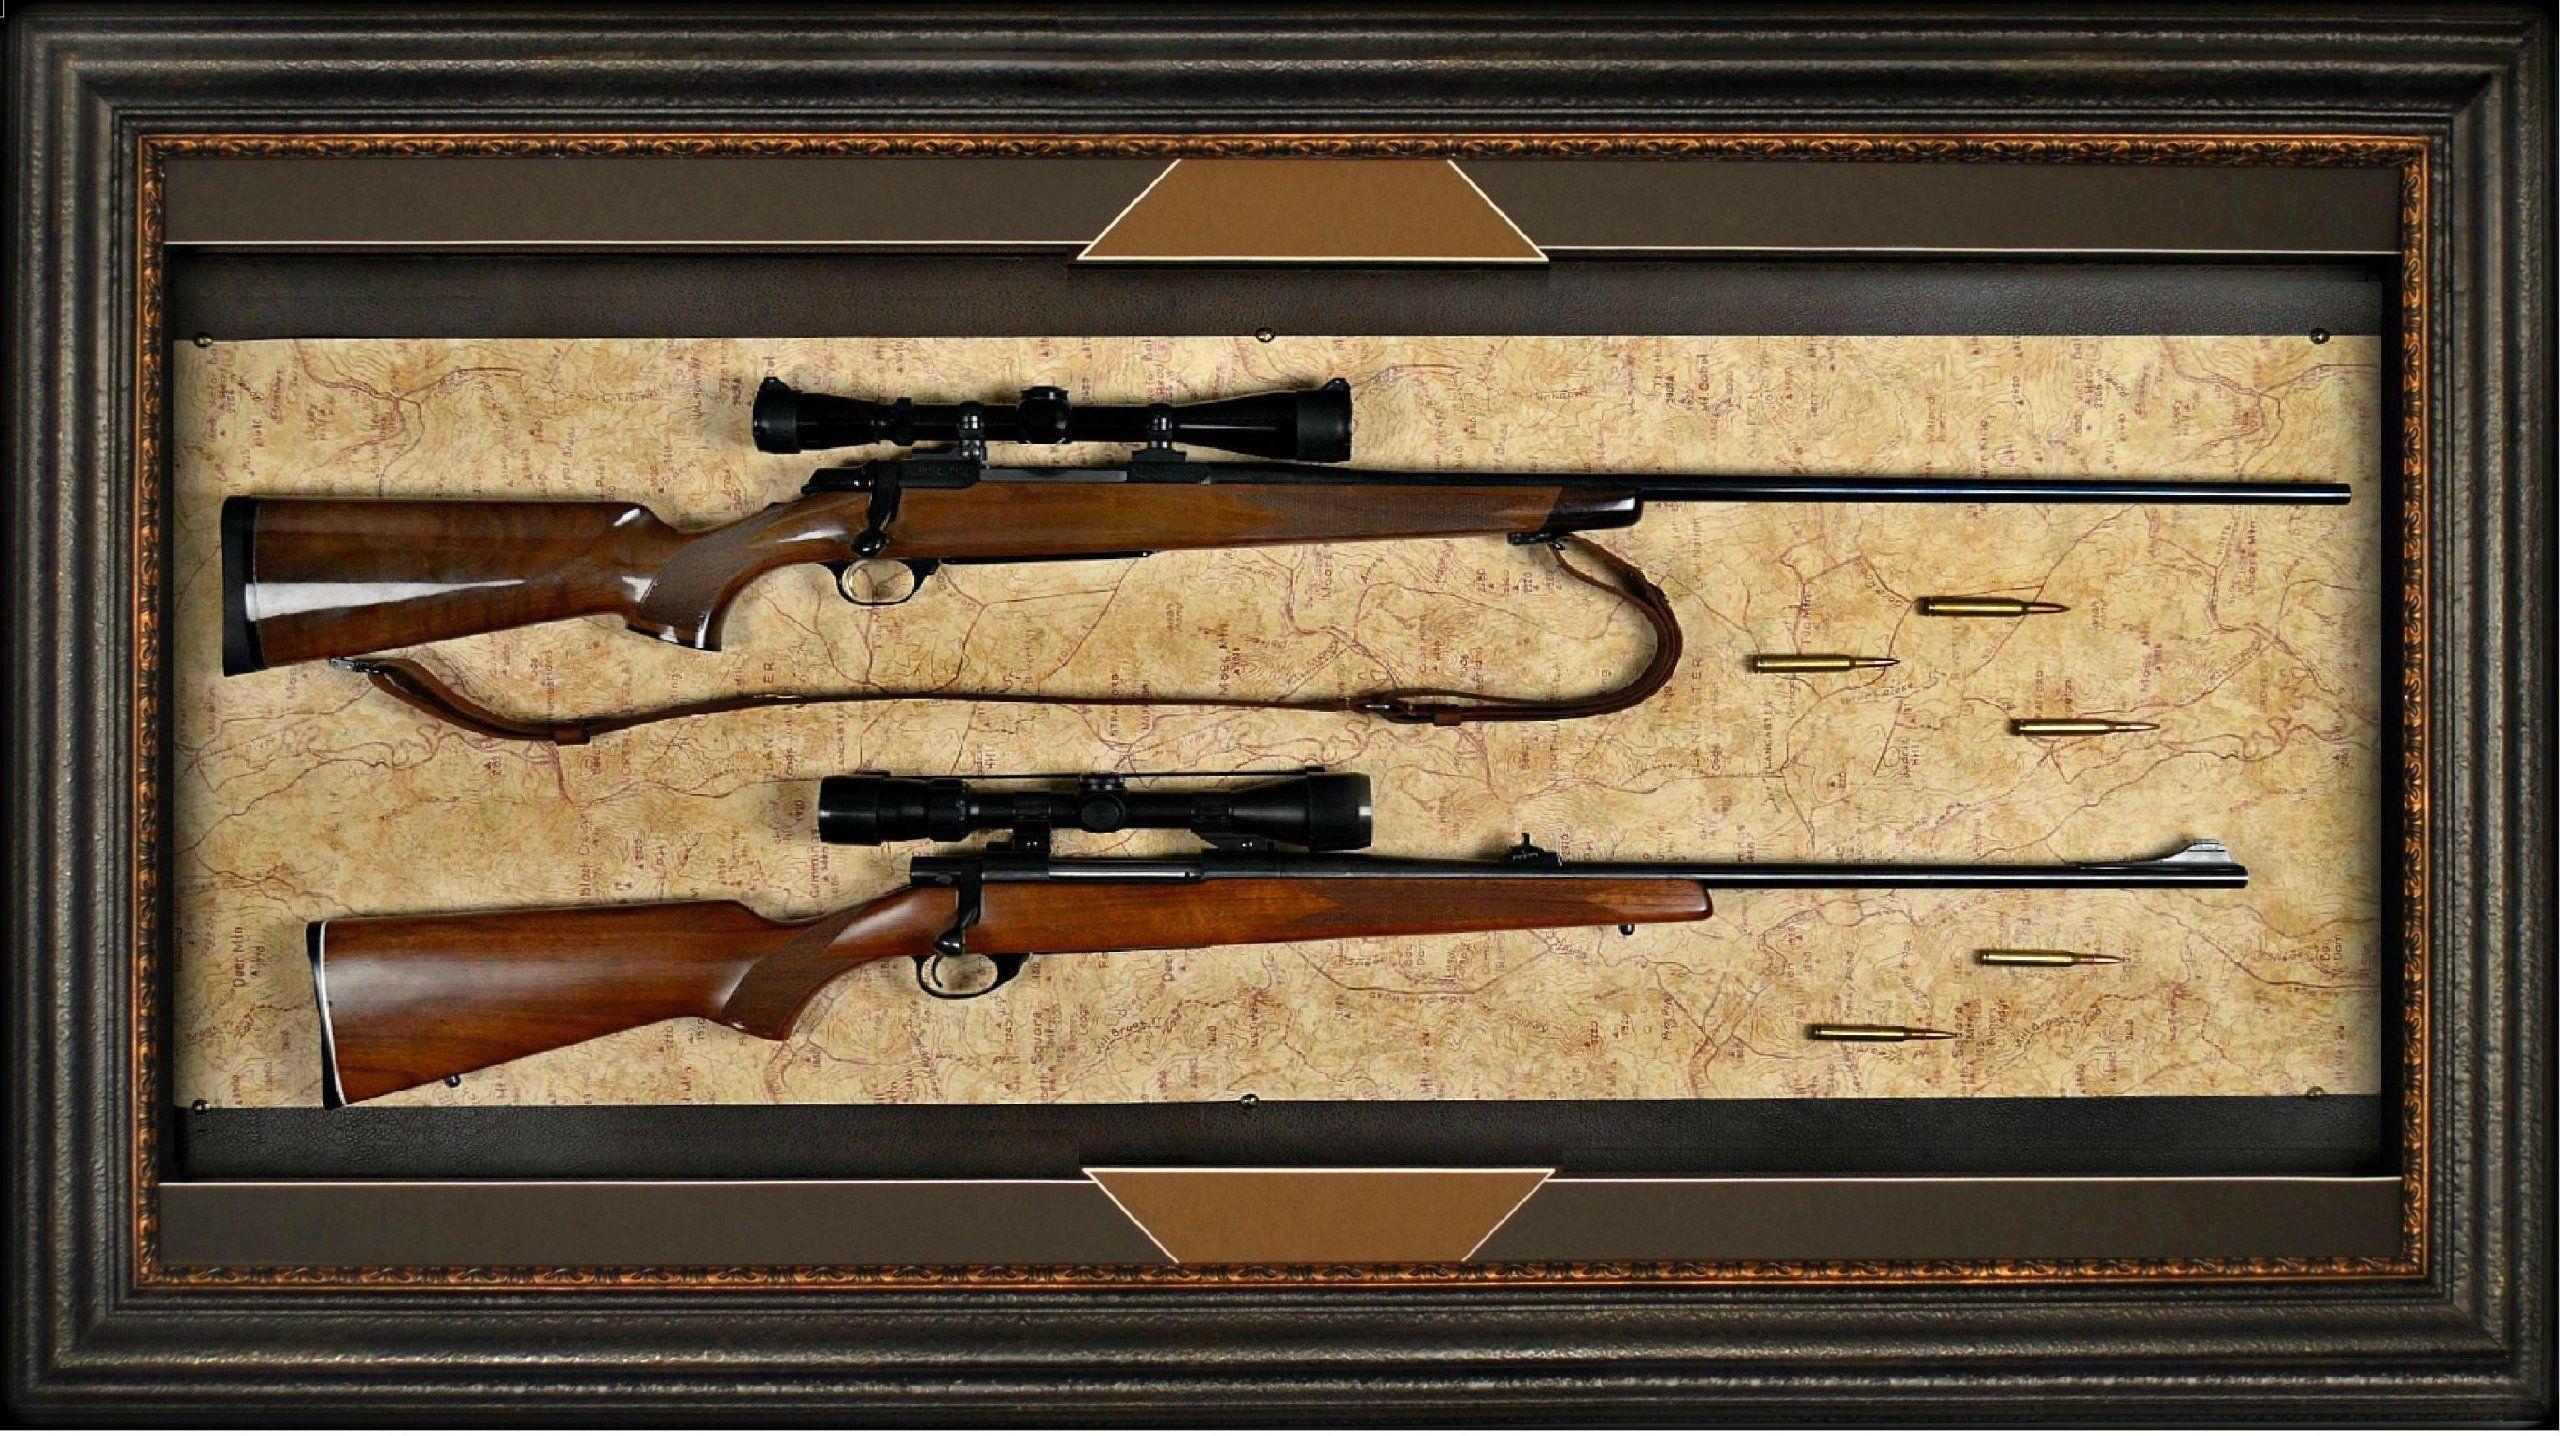 Double pistol handgun revolver gun display case cabinet rack shadowbox - Amazon Com Rifle Display Case Wall Mounted Dual Gun Display Case Perfect